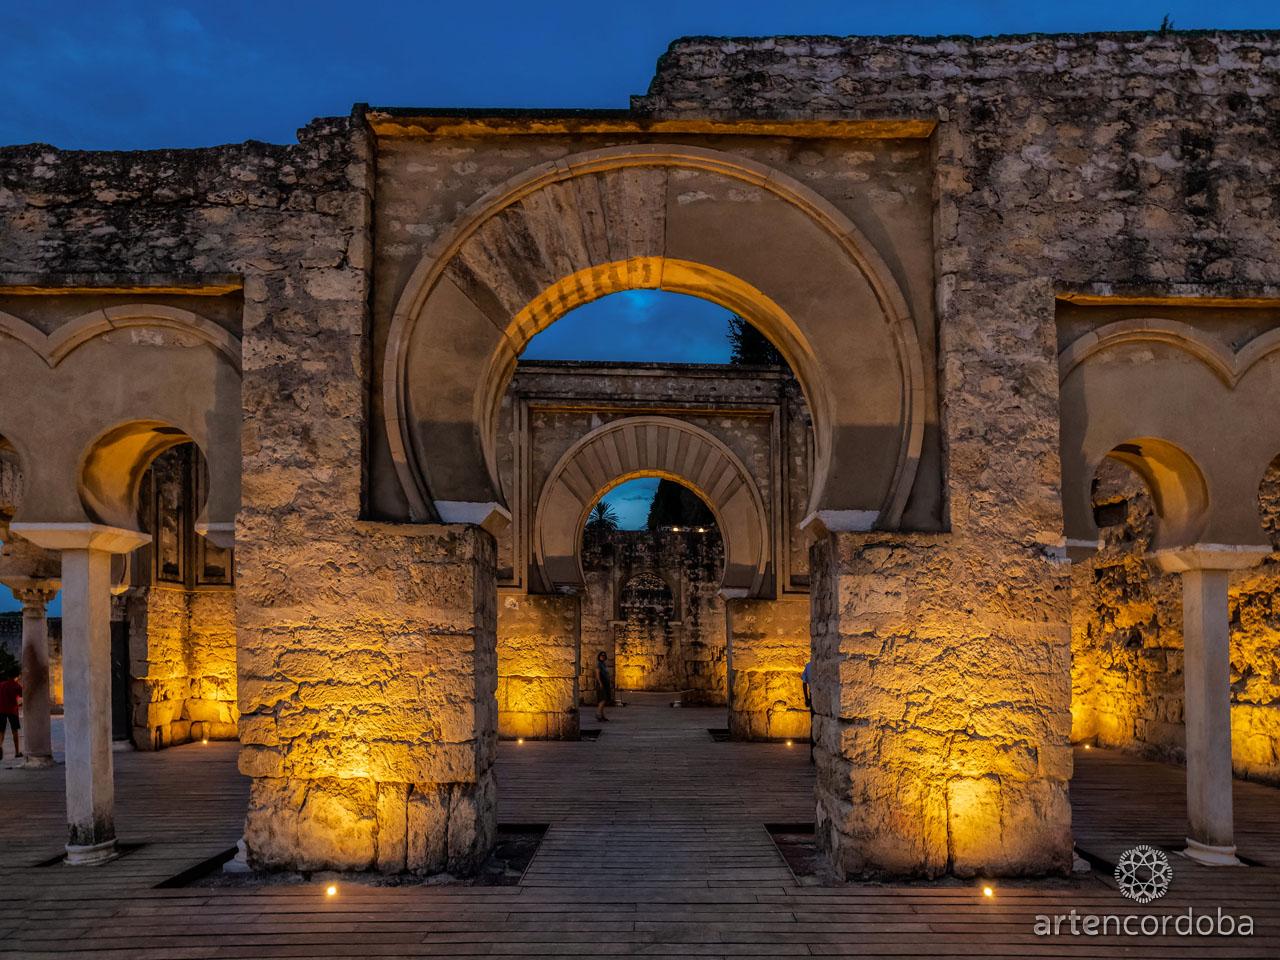 Visita guiada Medina Azahara de Noche